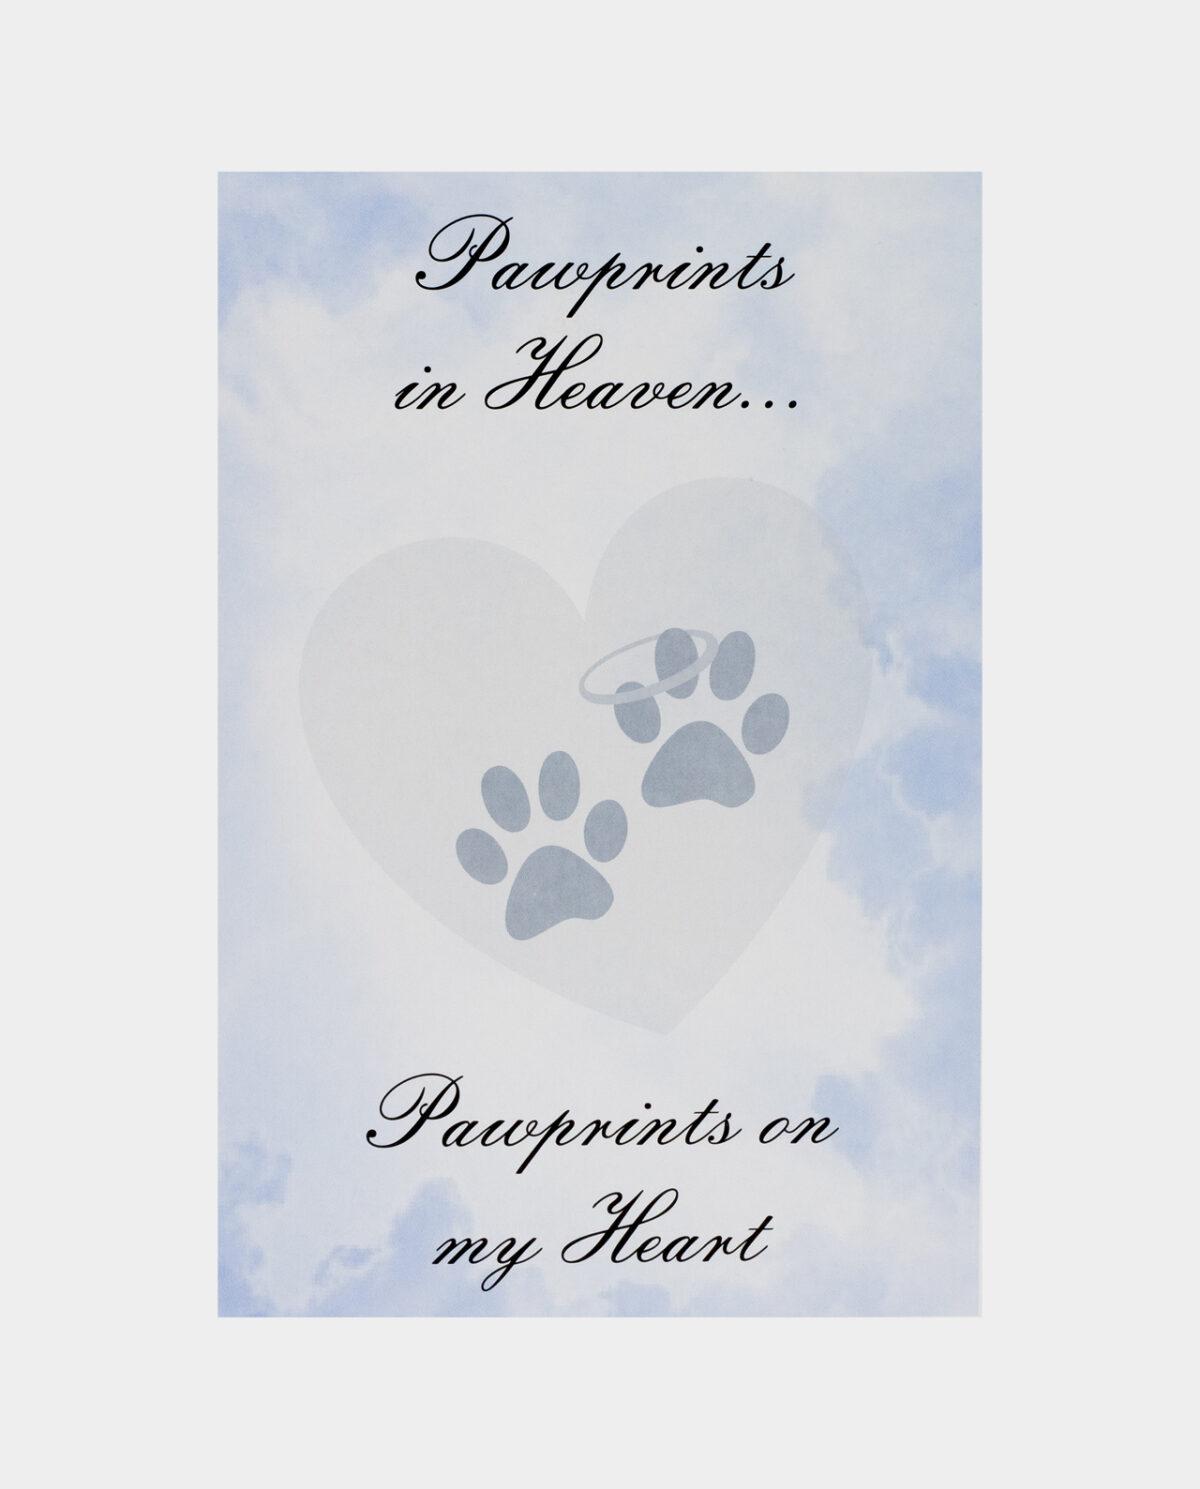 Pawprints in Heaven